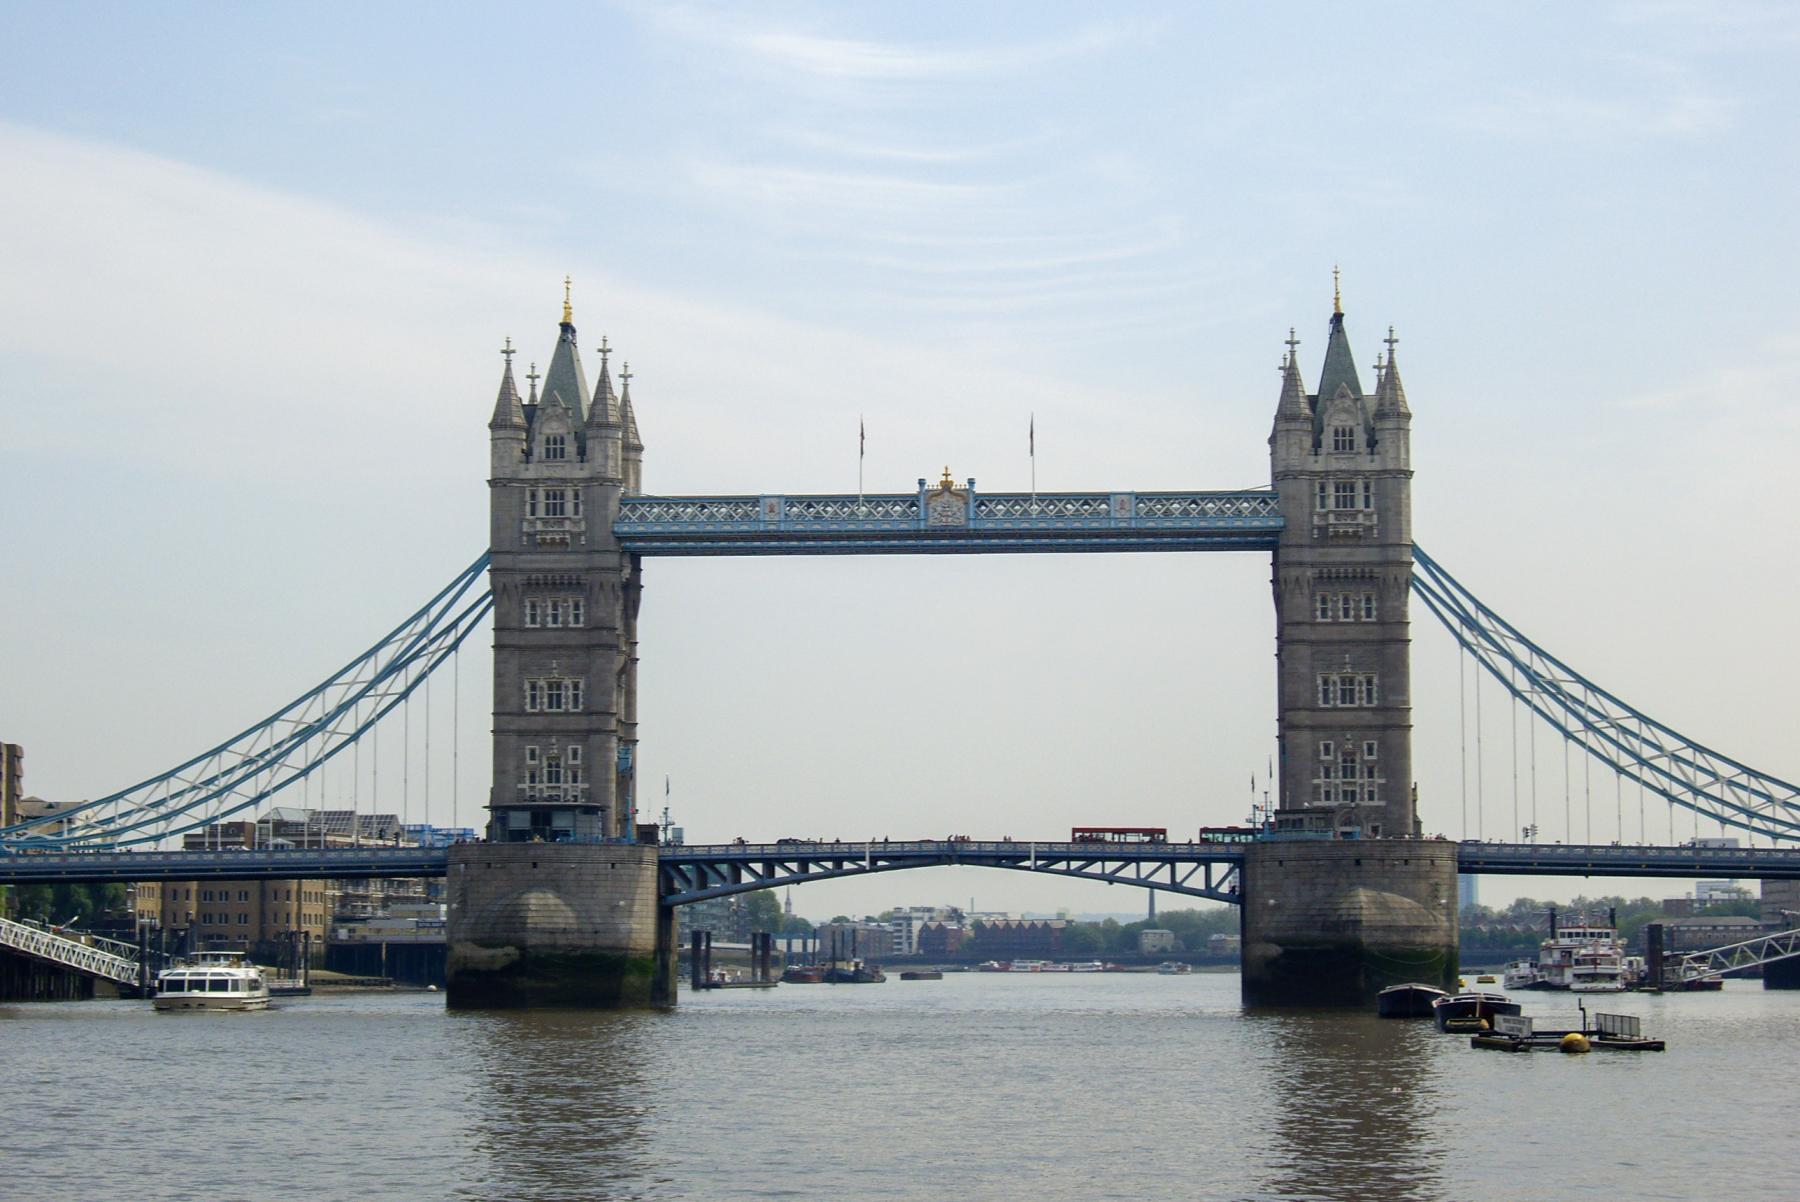 The Tower Bridge, London by Victoria Hearn